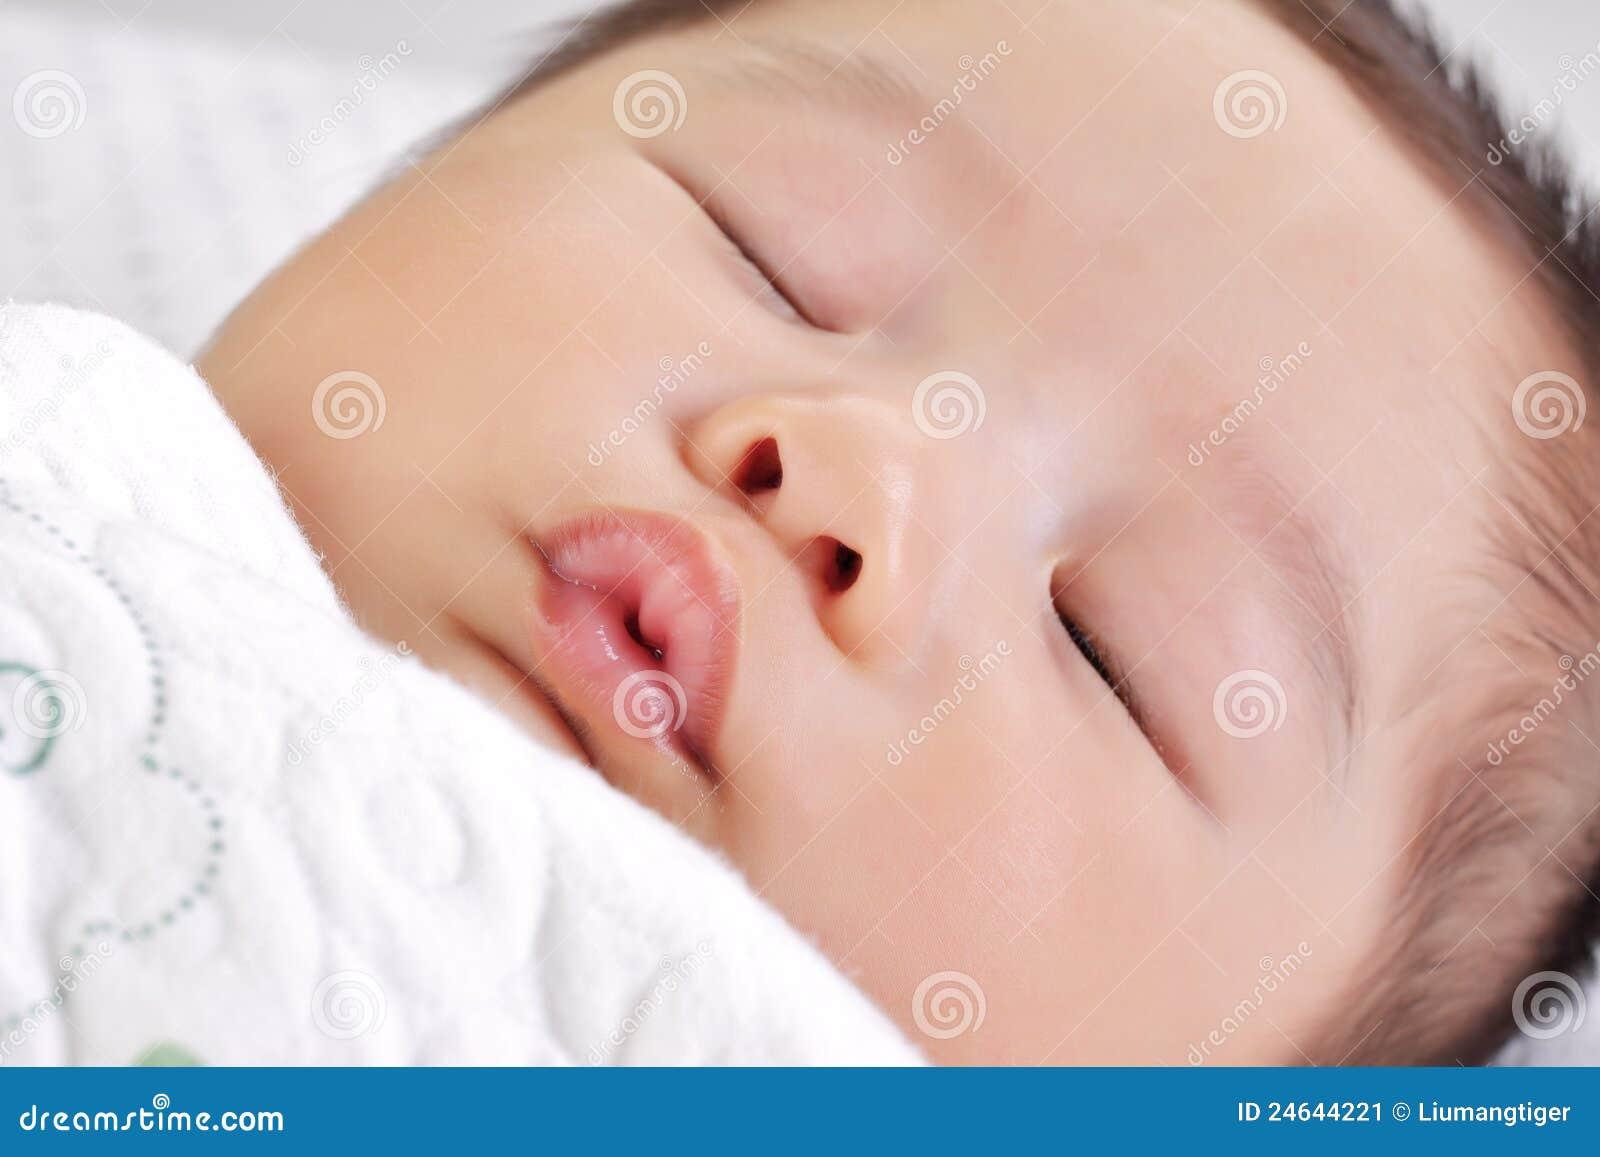 Face Of Sleeping Baby 3 Stock Image - Image: 24644221